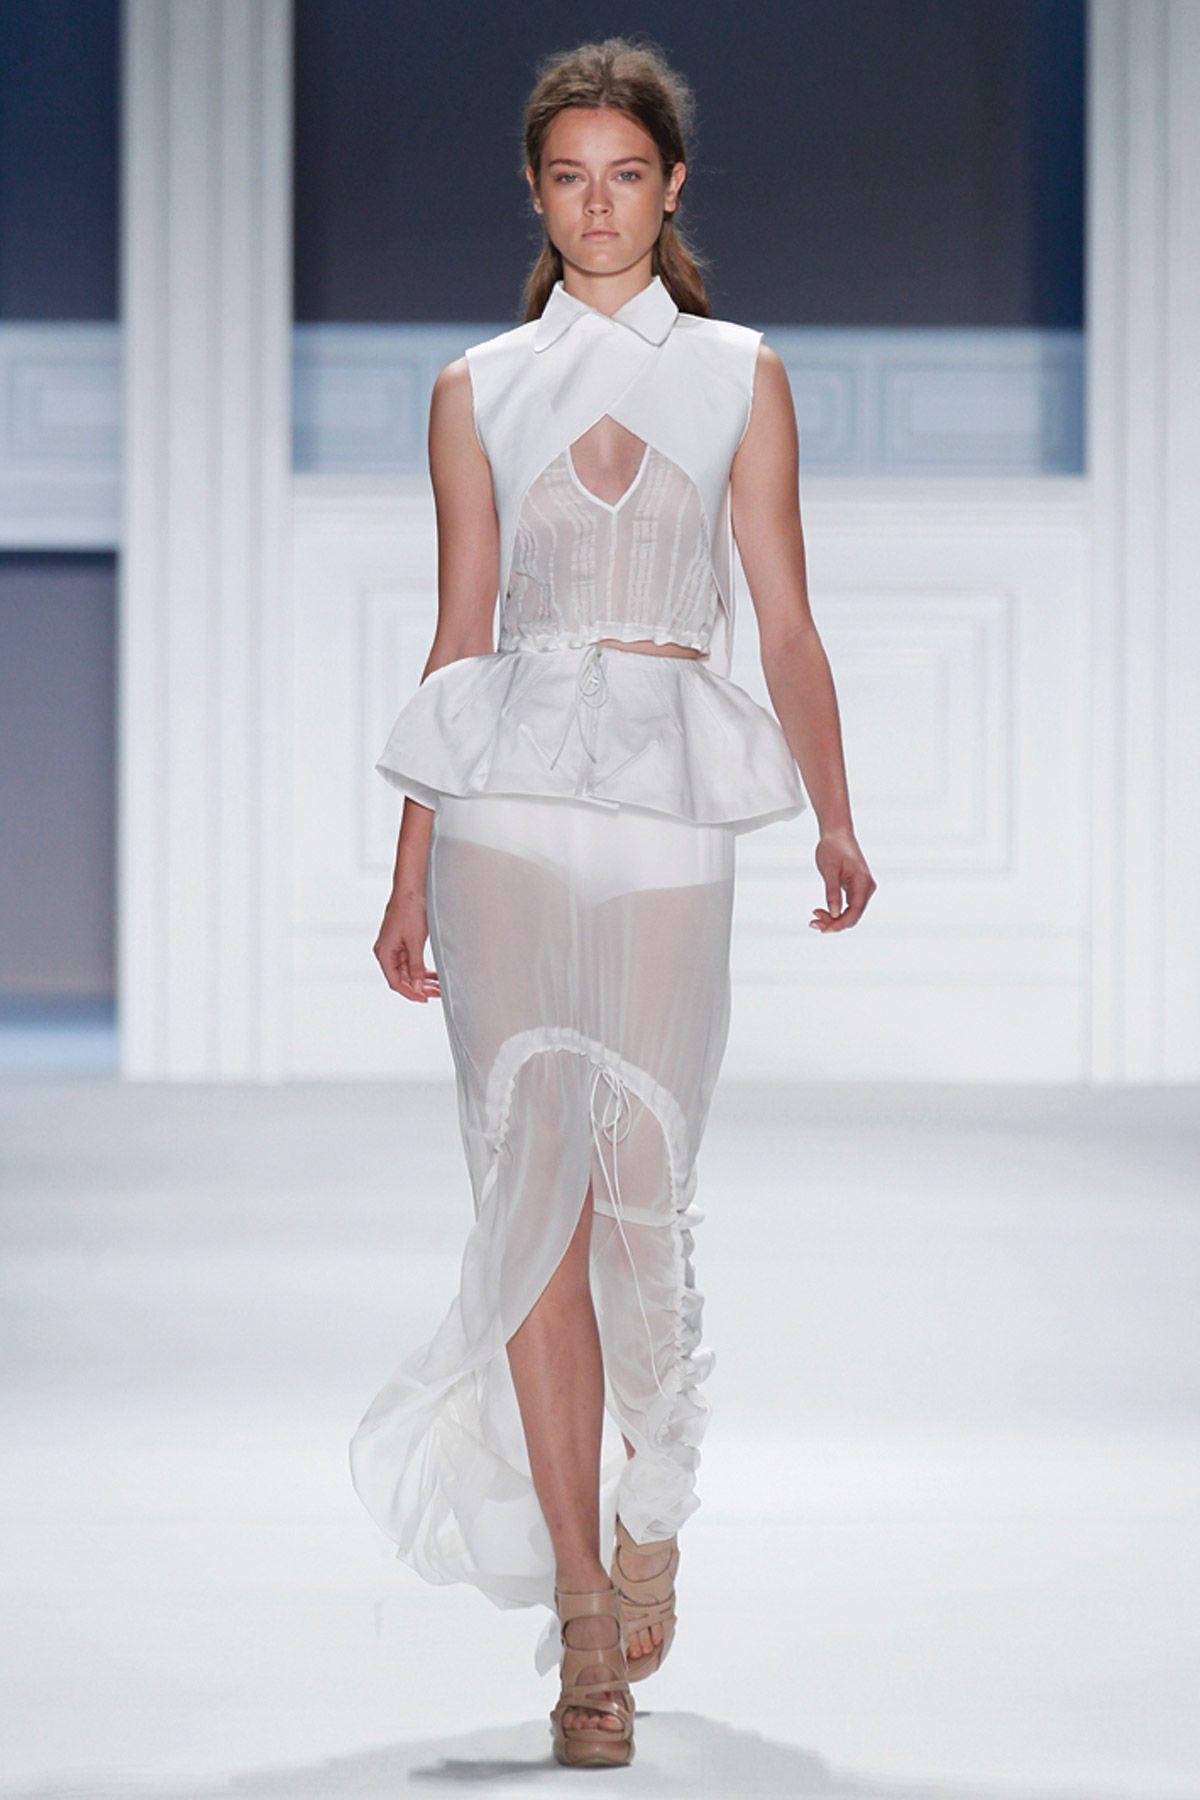 White silk-linen striped V-neck top with white mackintosh cotton criss cross collar overlay and drawstring peplum over white silk chiffon sheer drawstring maxi skirt.